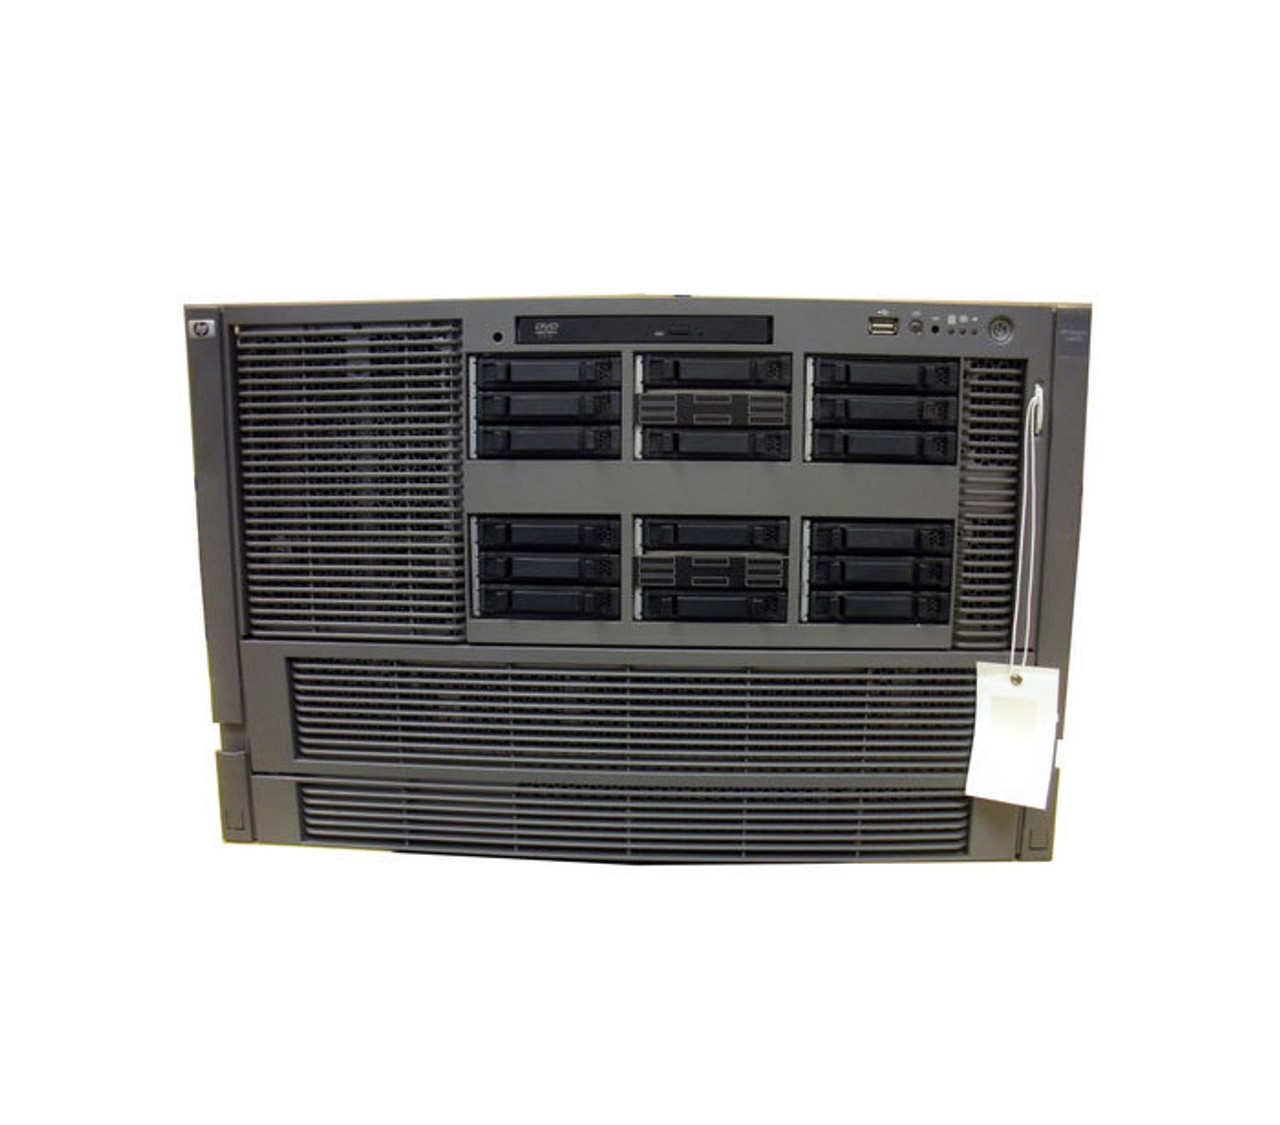 HP Integrity rx6600 Servers